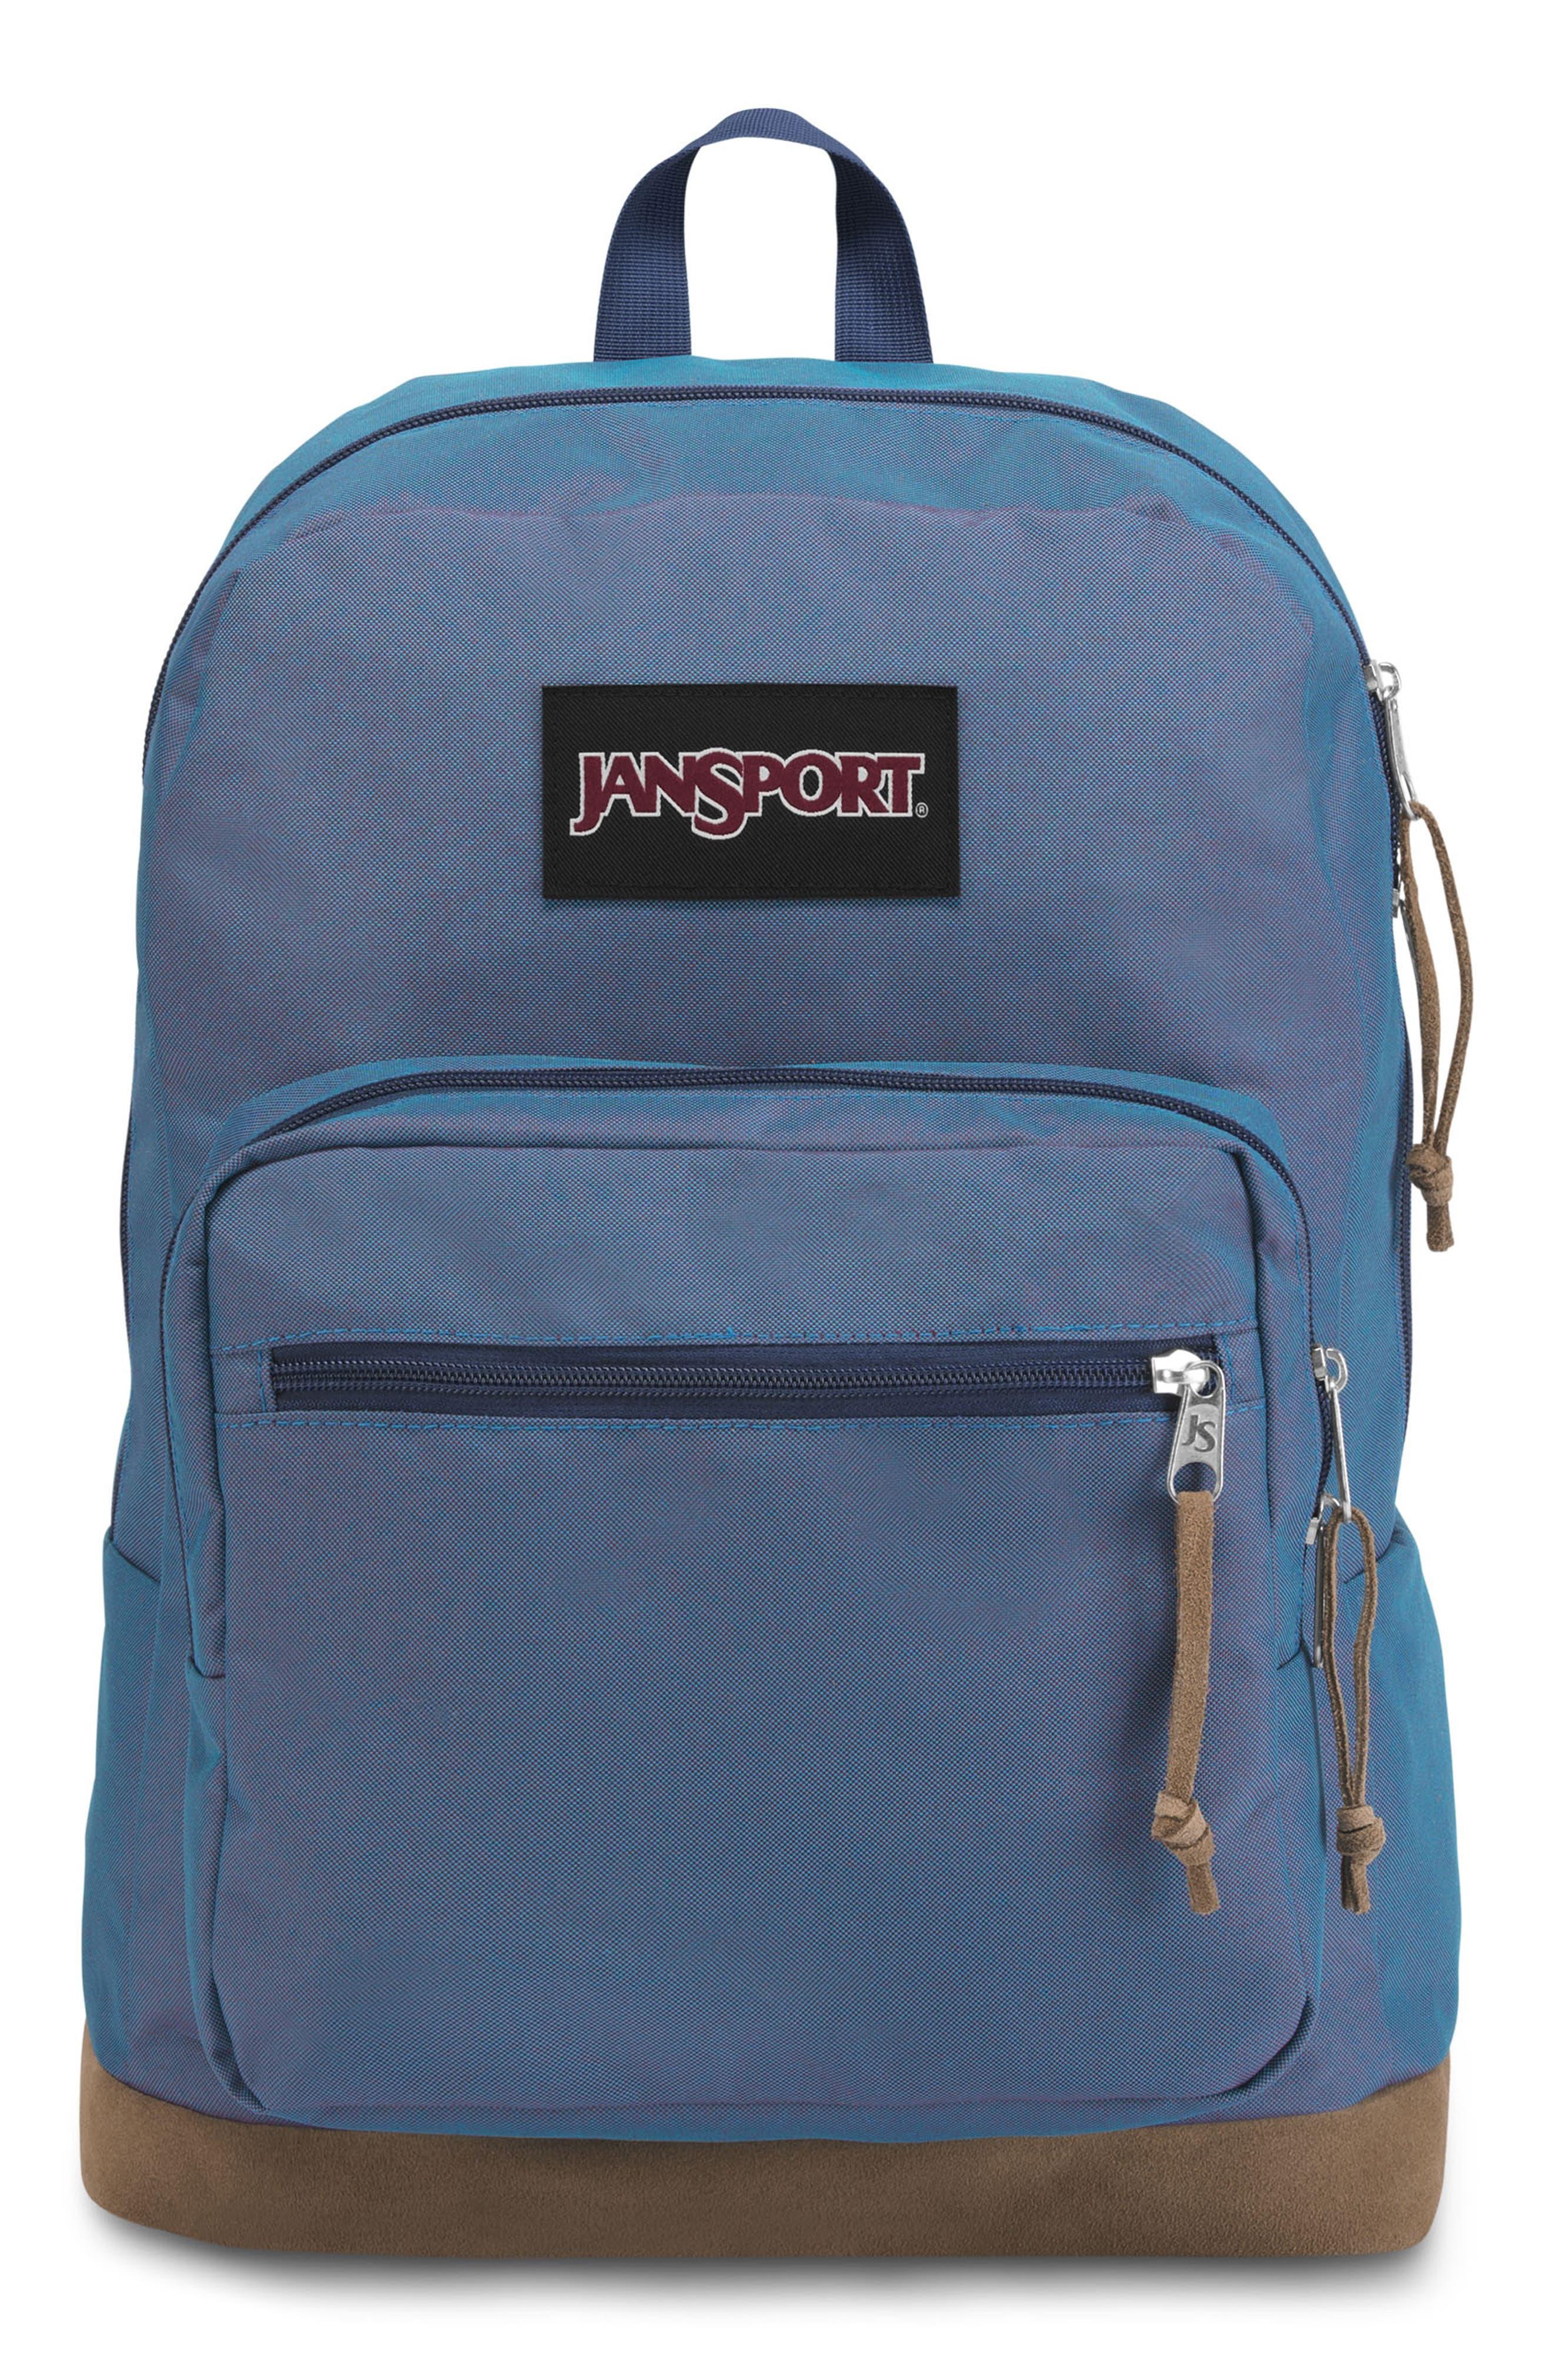 Jansport Right Pack Digital Edition Backpack -